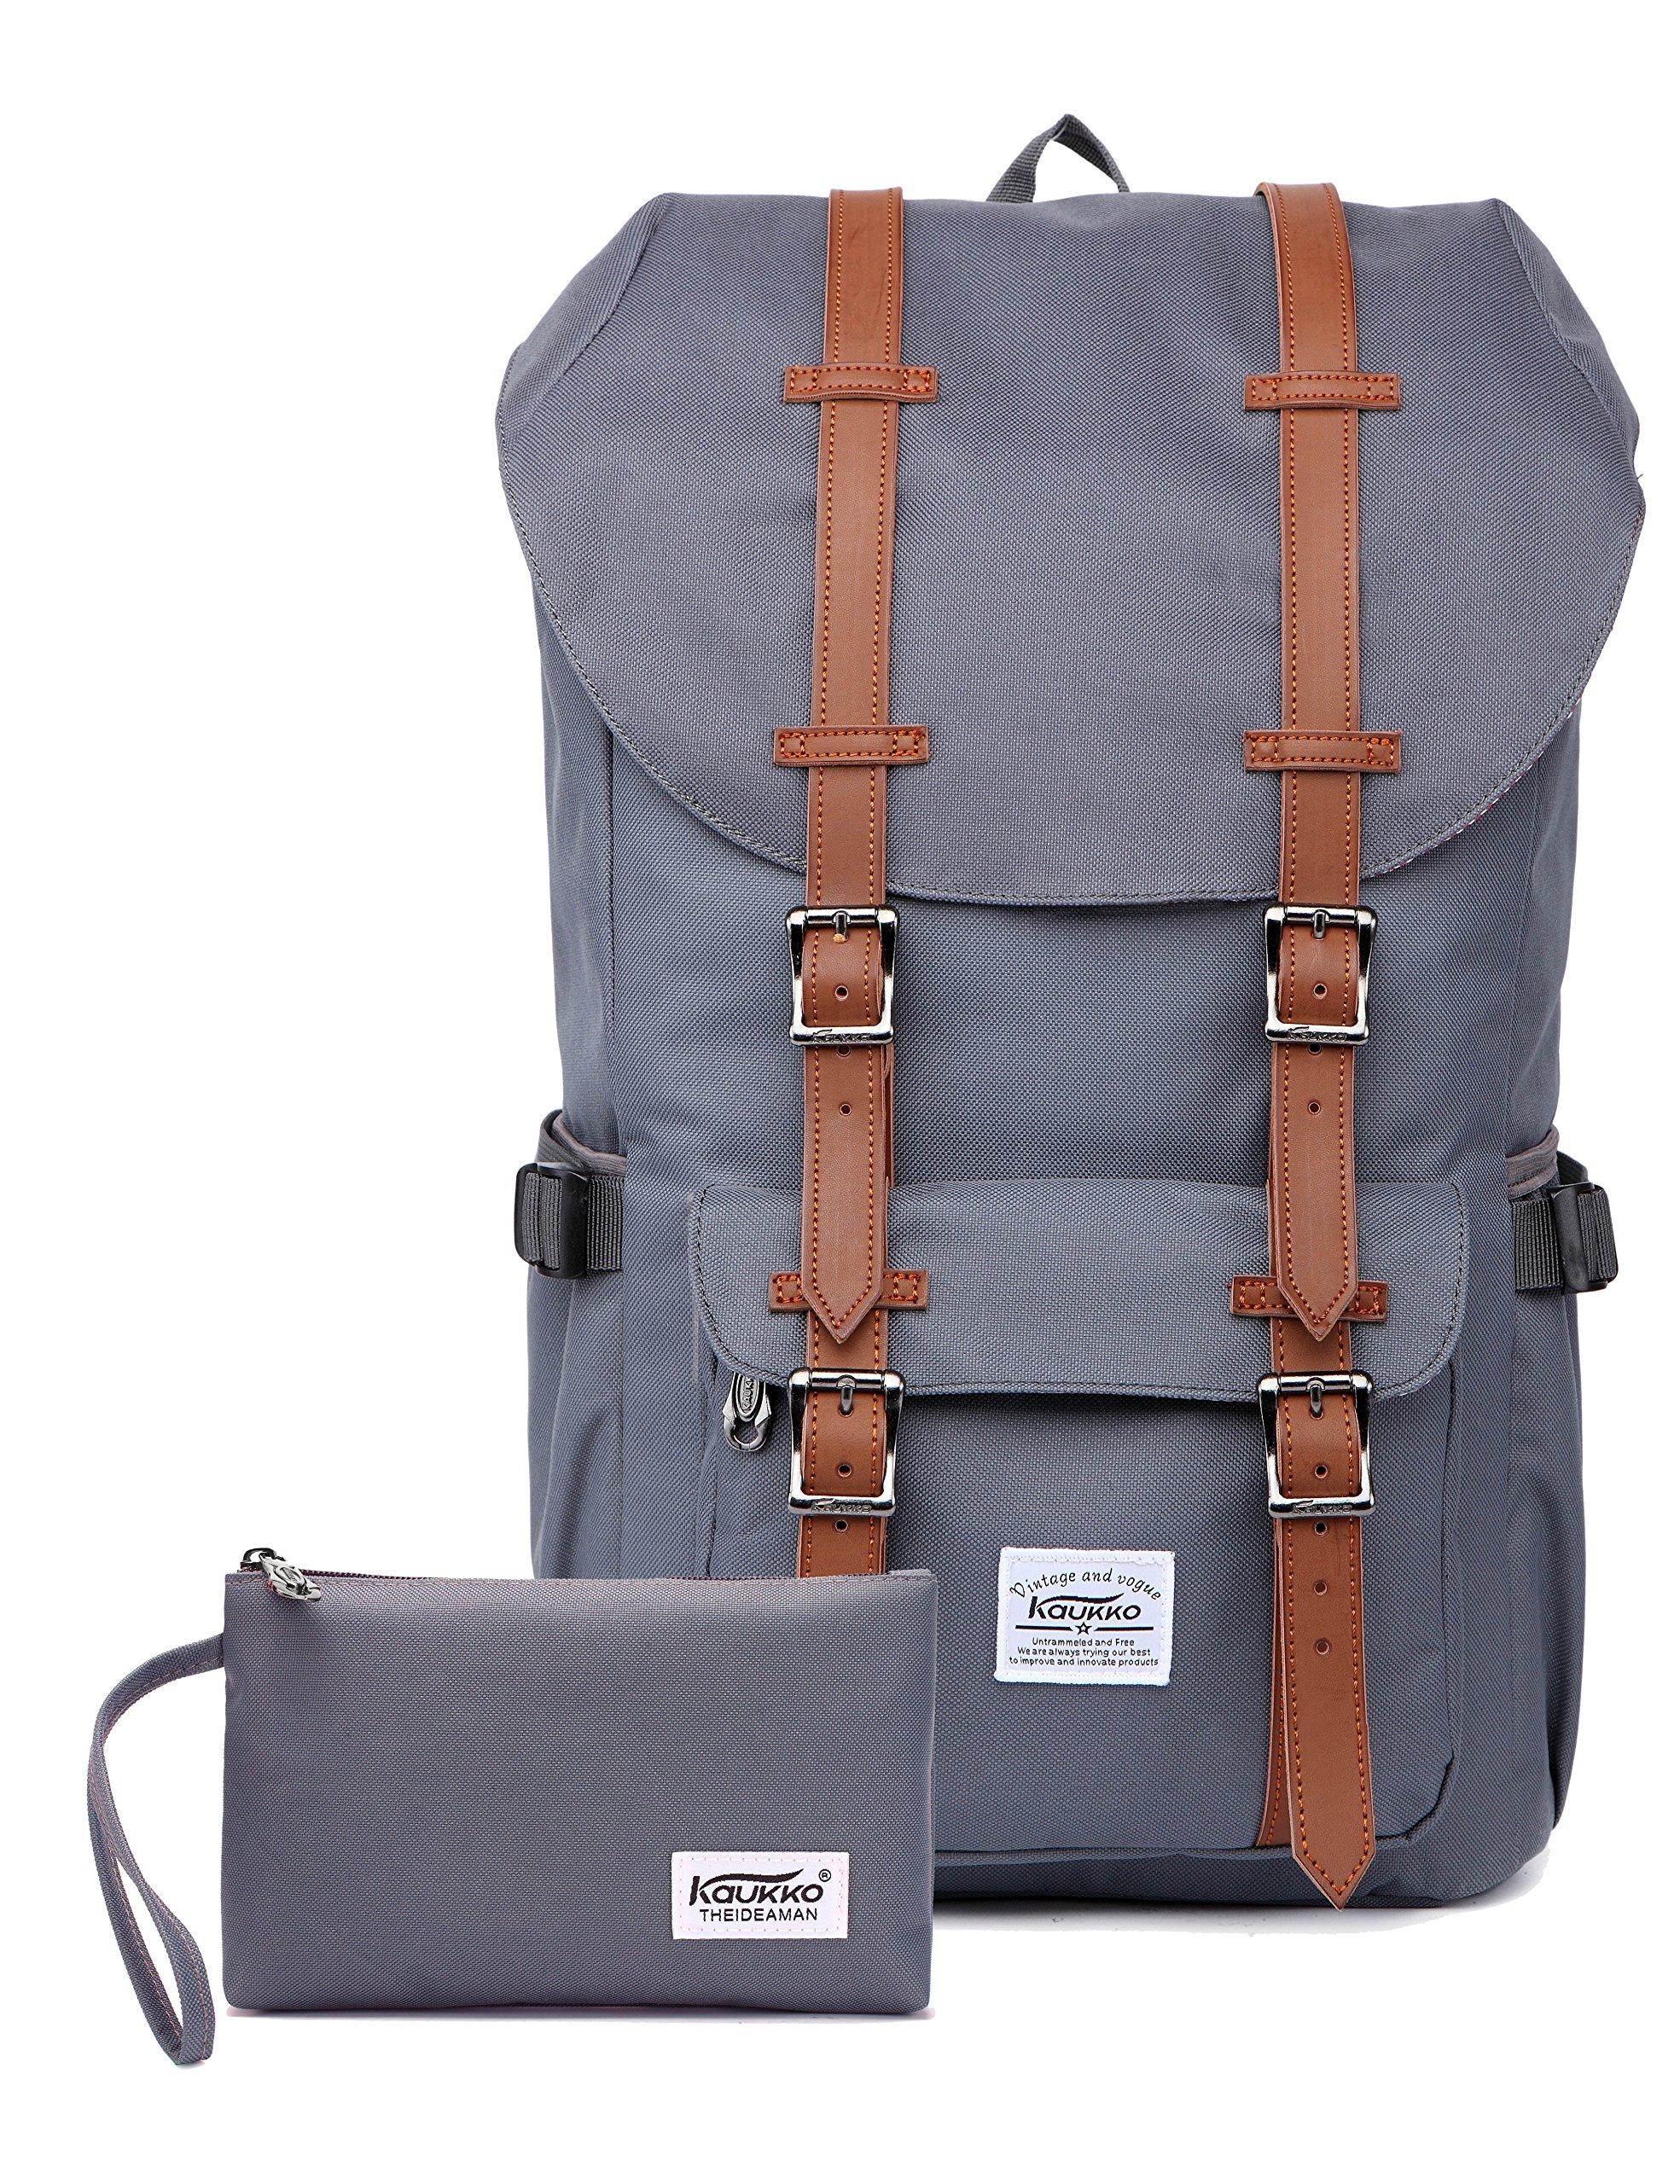 KAUKKO Laptop Outdoor Backpack, Travel Hiking& Camping Rucksack Pack, Casual Large College School Daypack, Shoulder Book Bags Back Fits 15'' Laptop & Tablets (NGrey 2pcs)